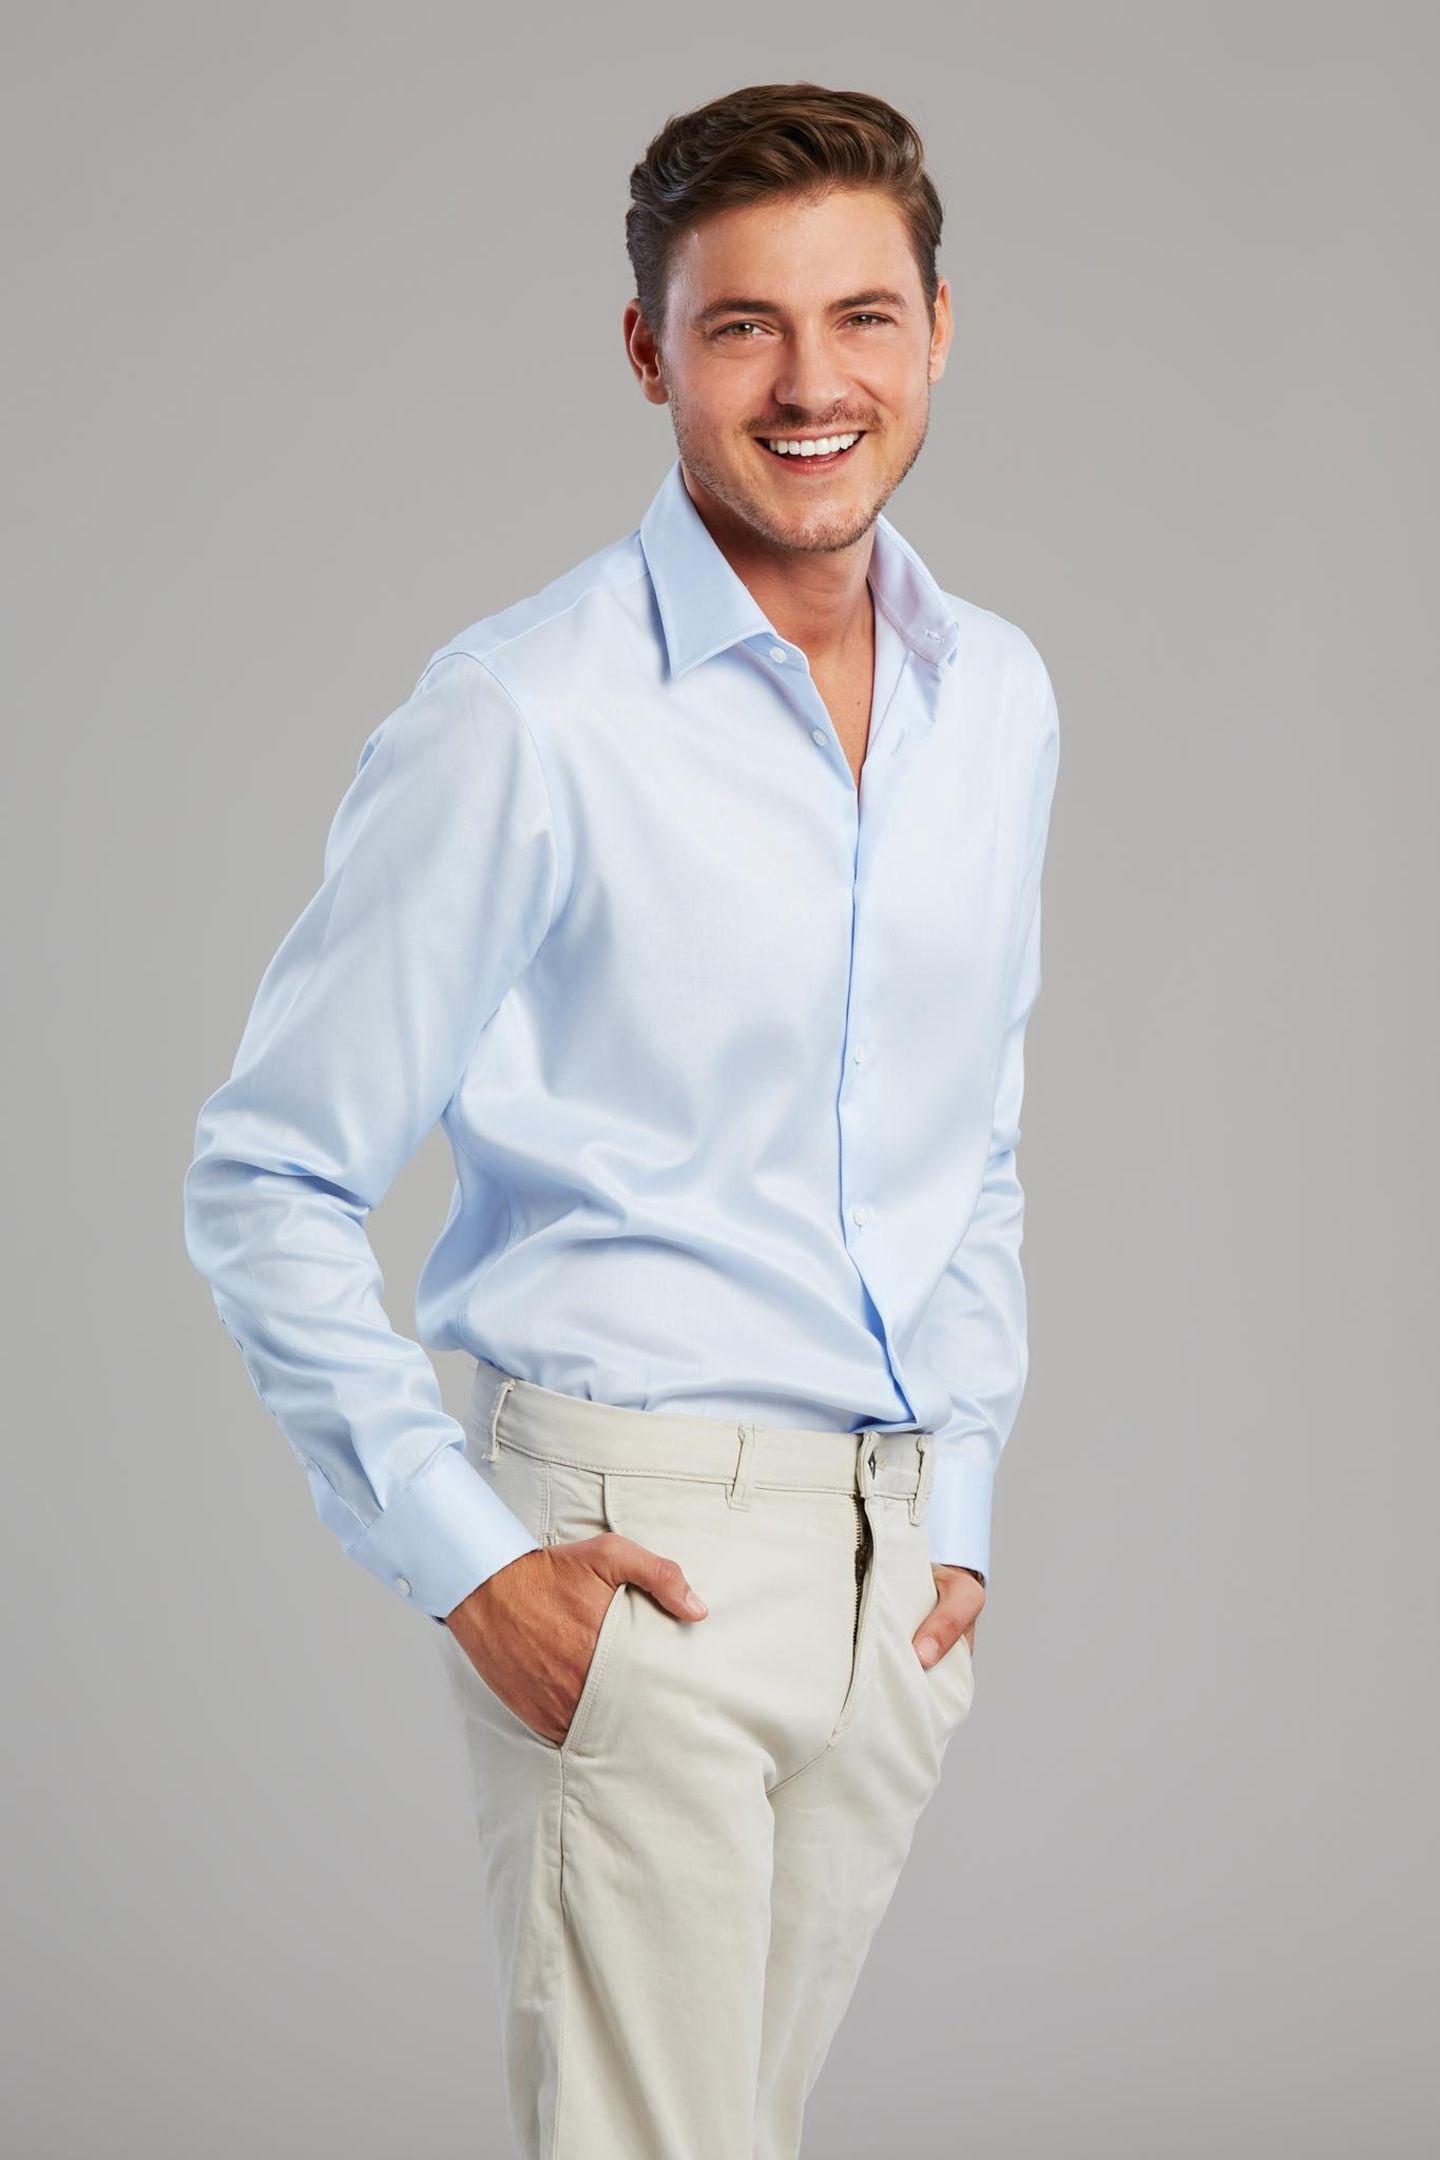 Prince Charming: Mann im blauen Hemd